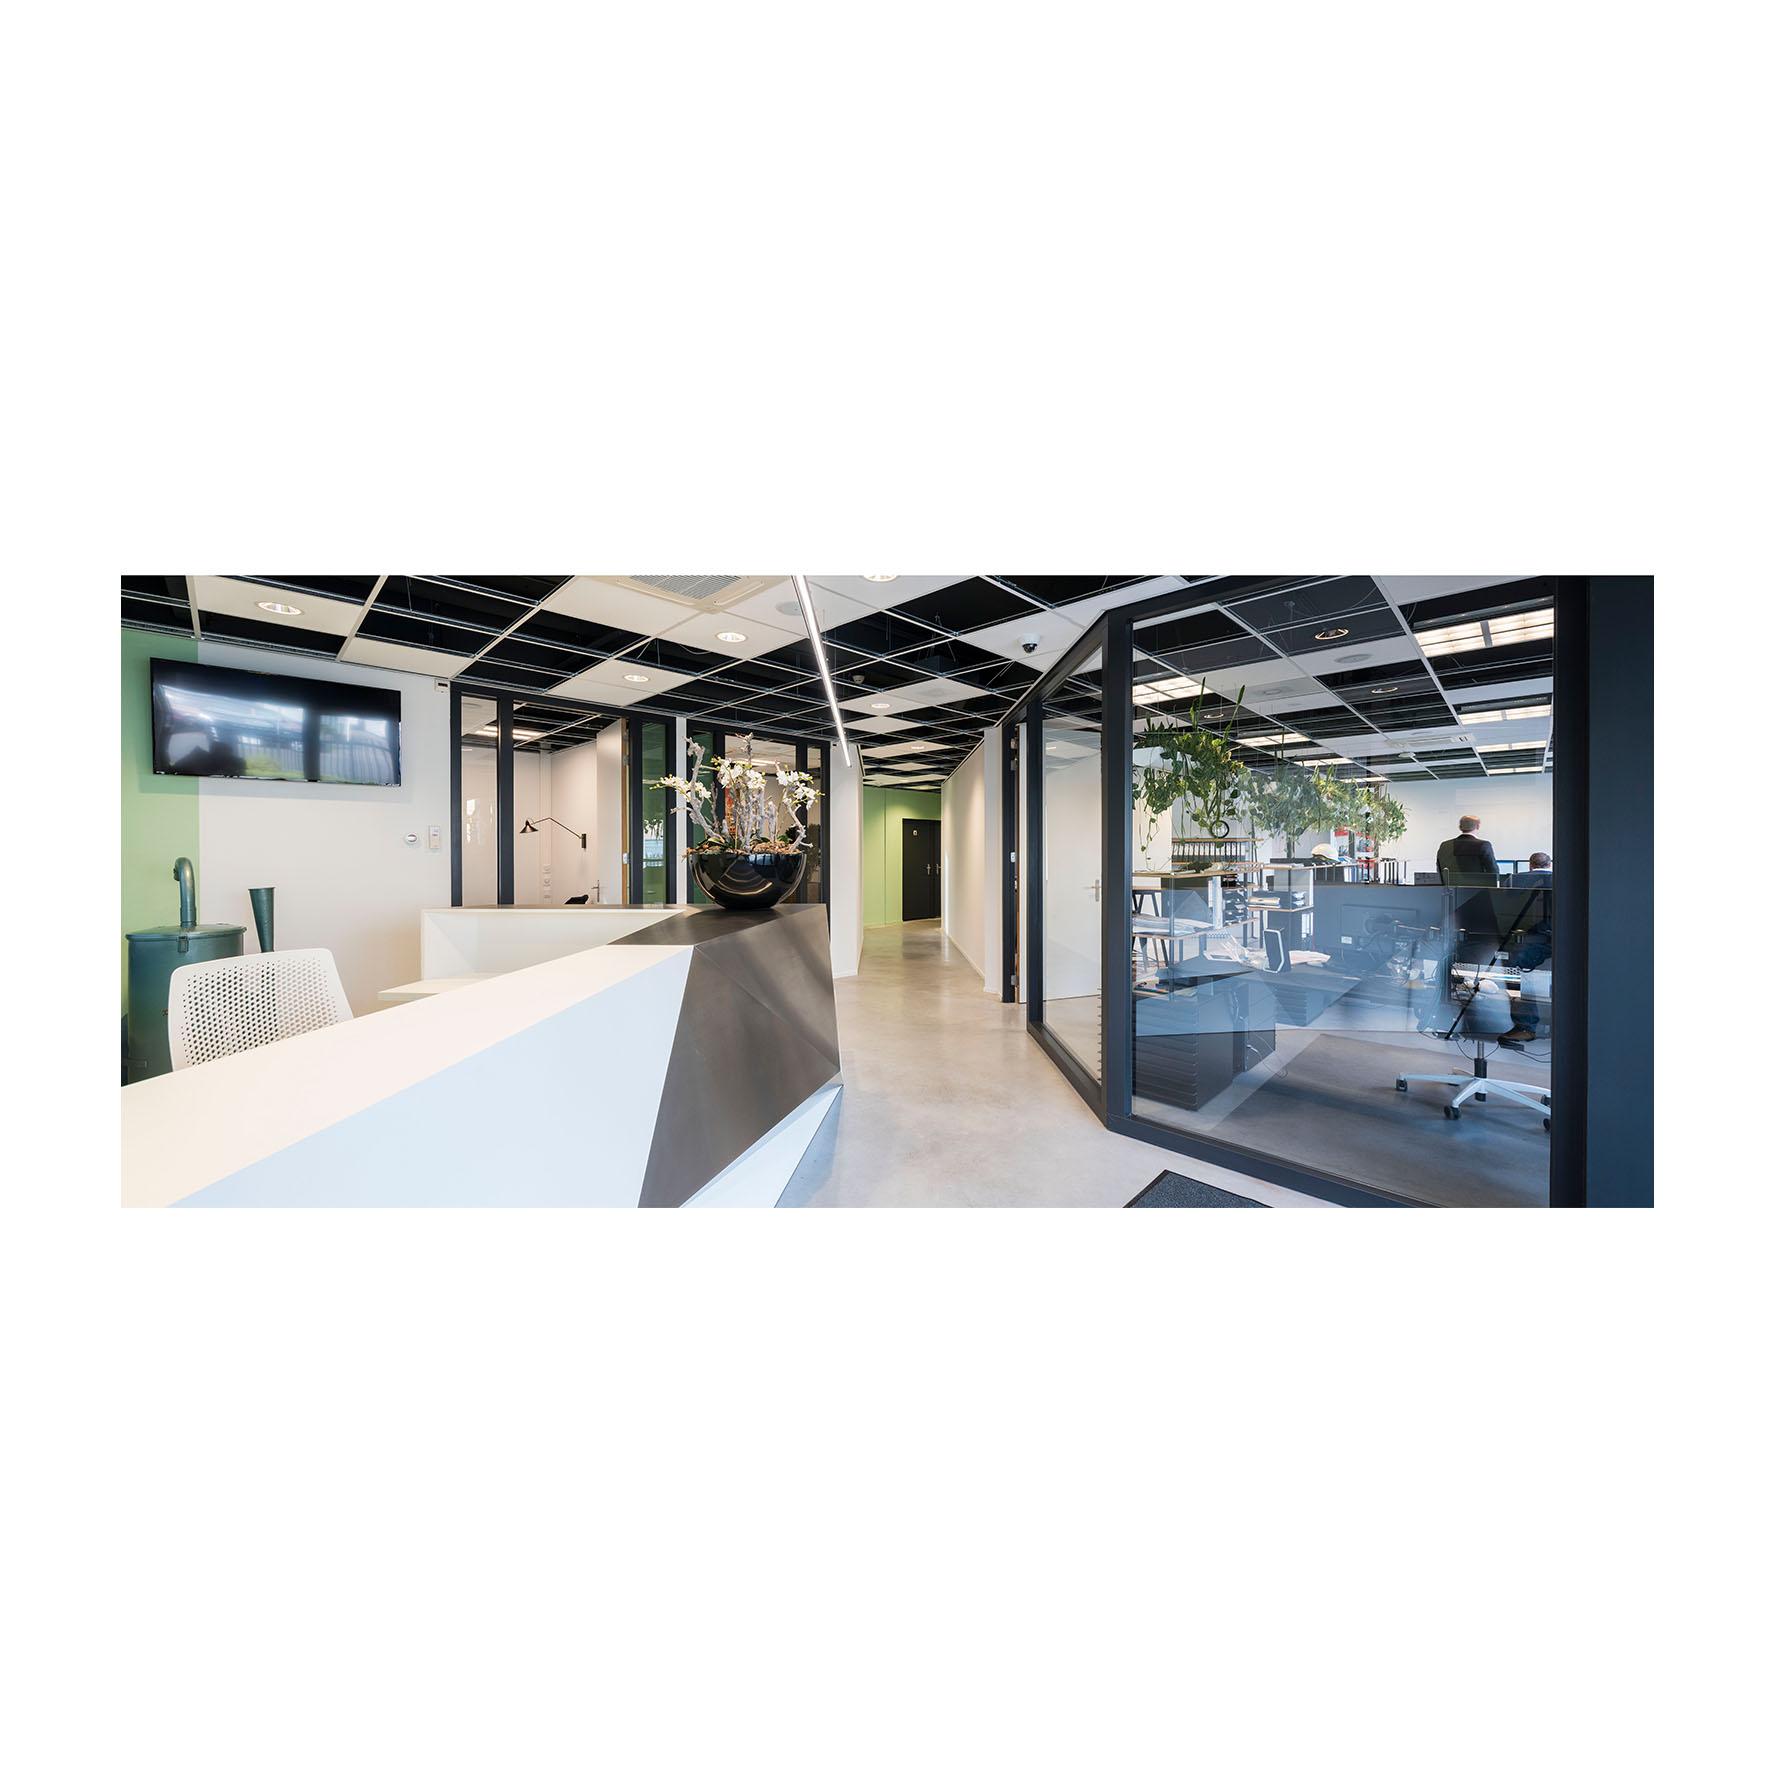 Interieurfotografie - Bas Vrehen, Frerker architecten